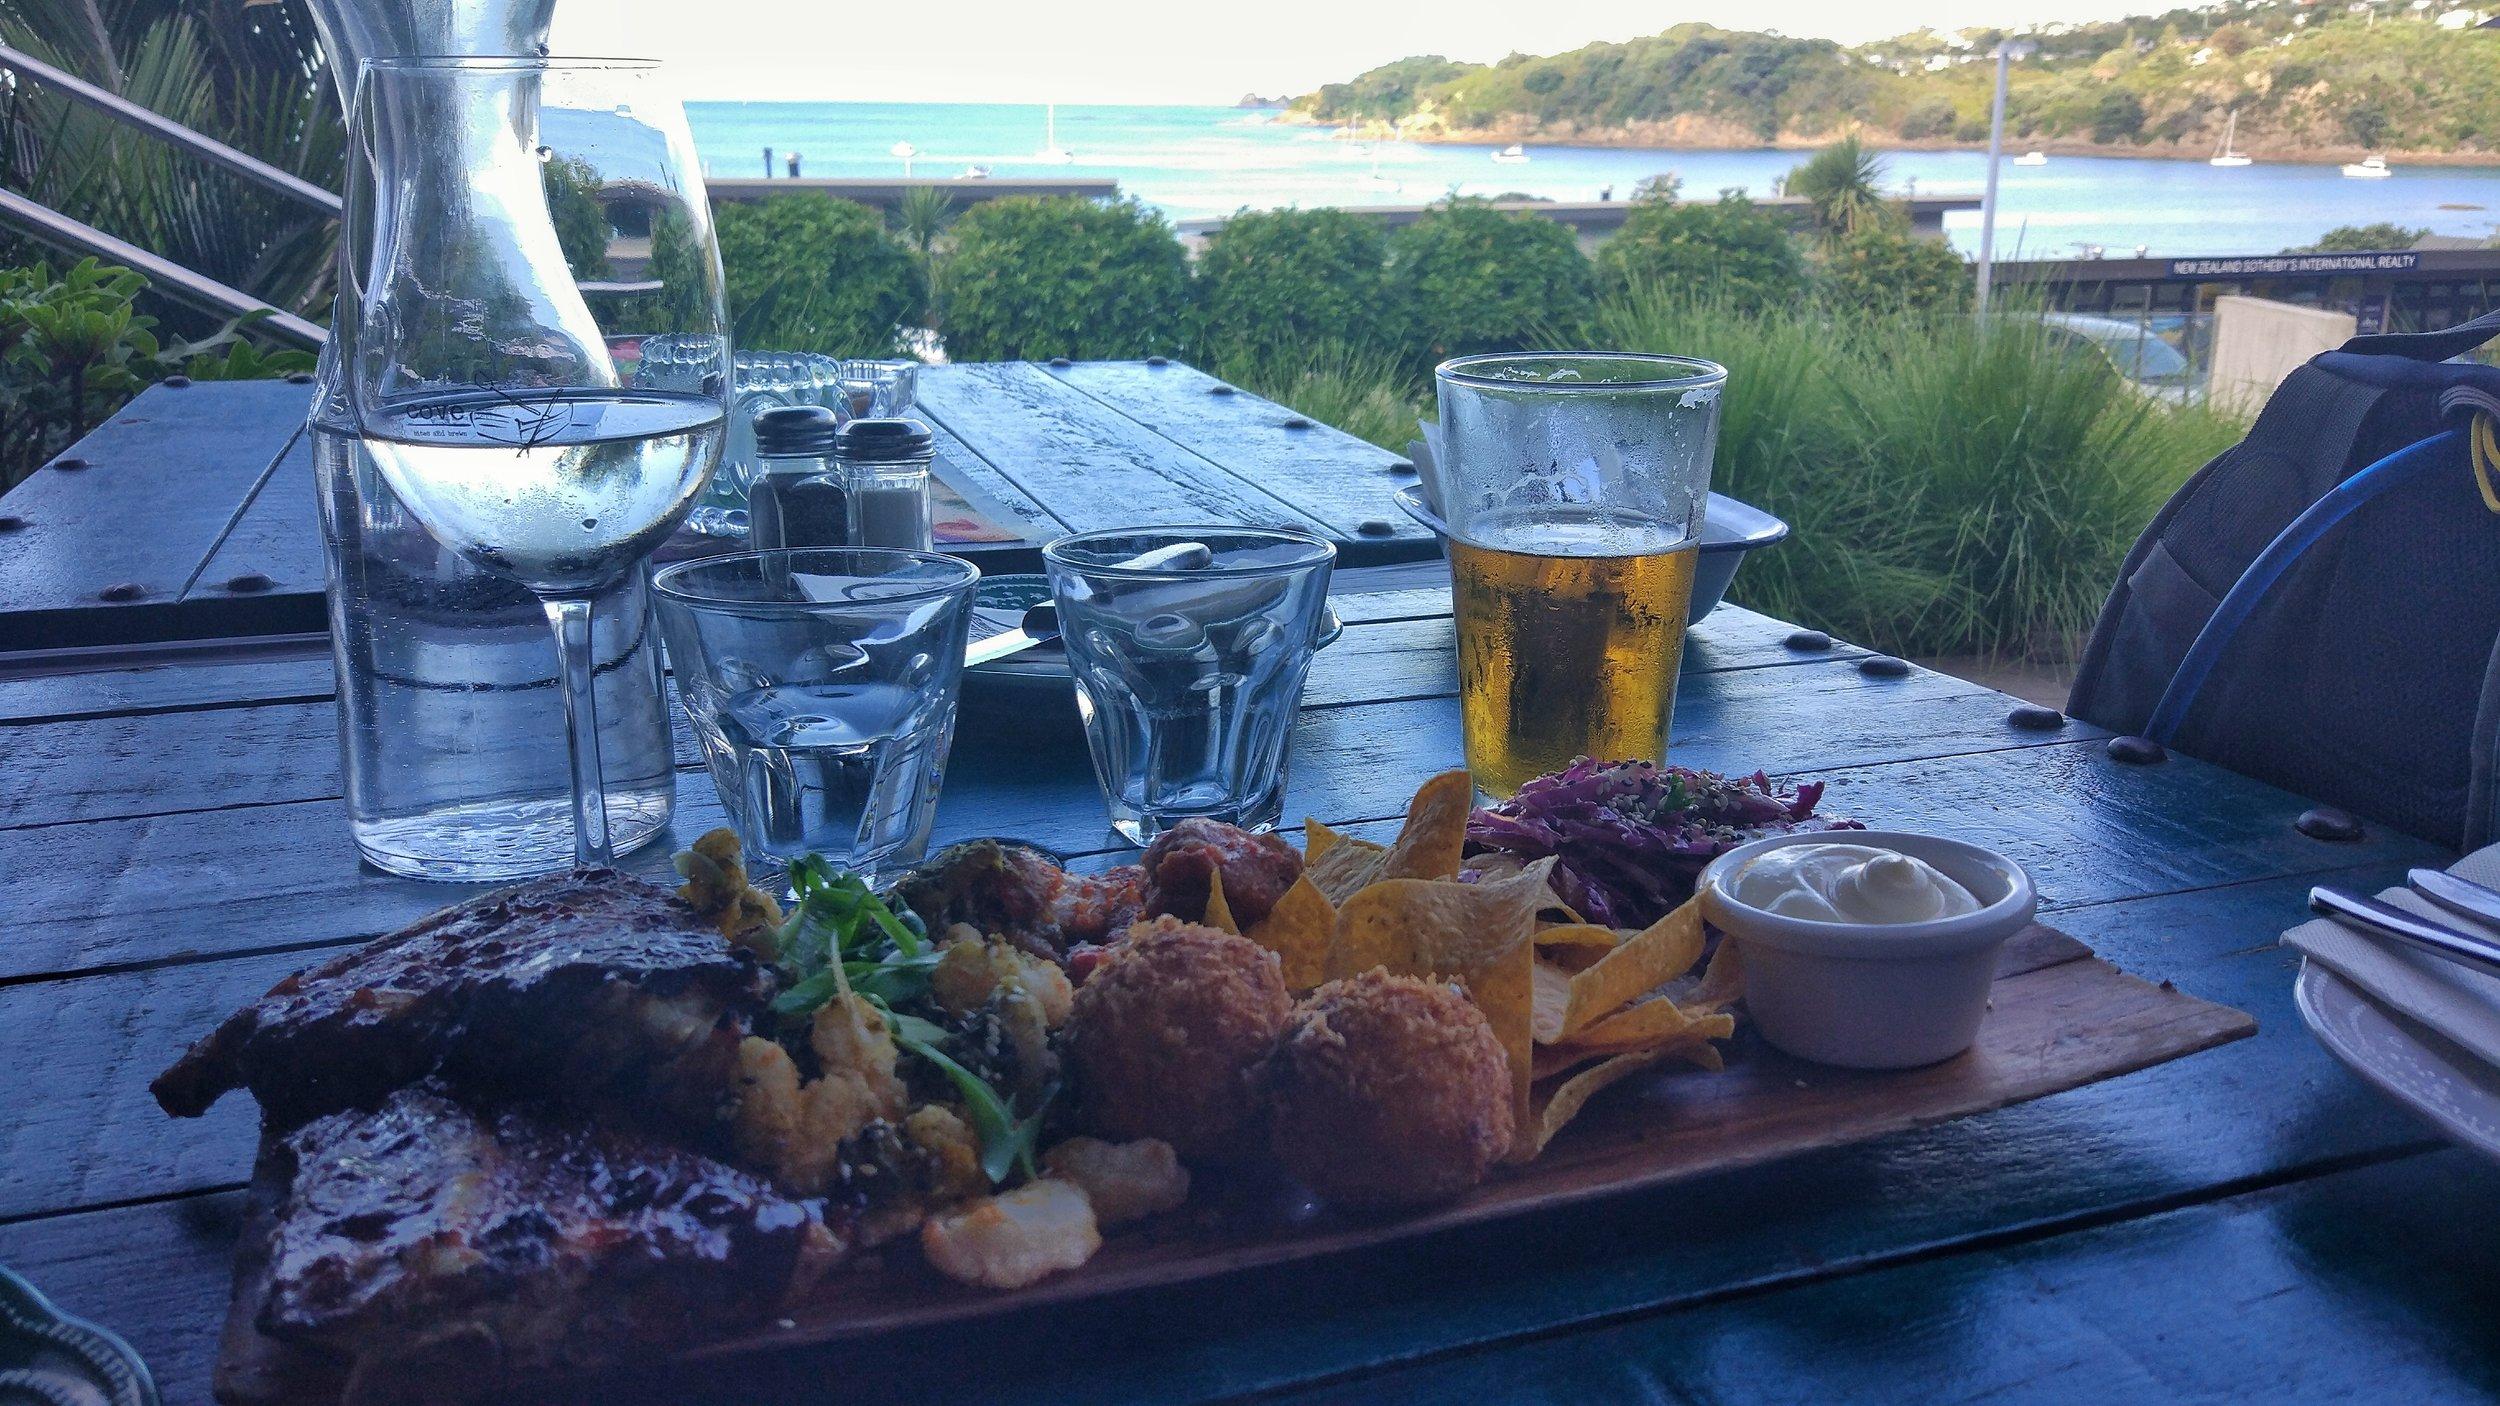 Pub grub, a glass of wine and a beer on Waiheke island